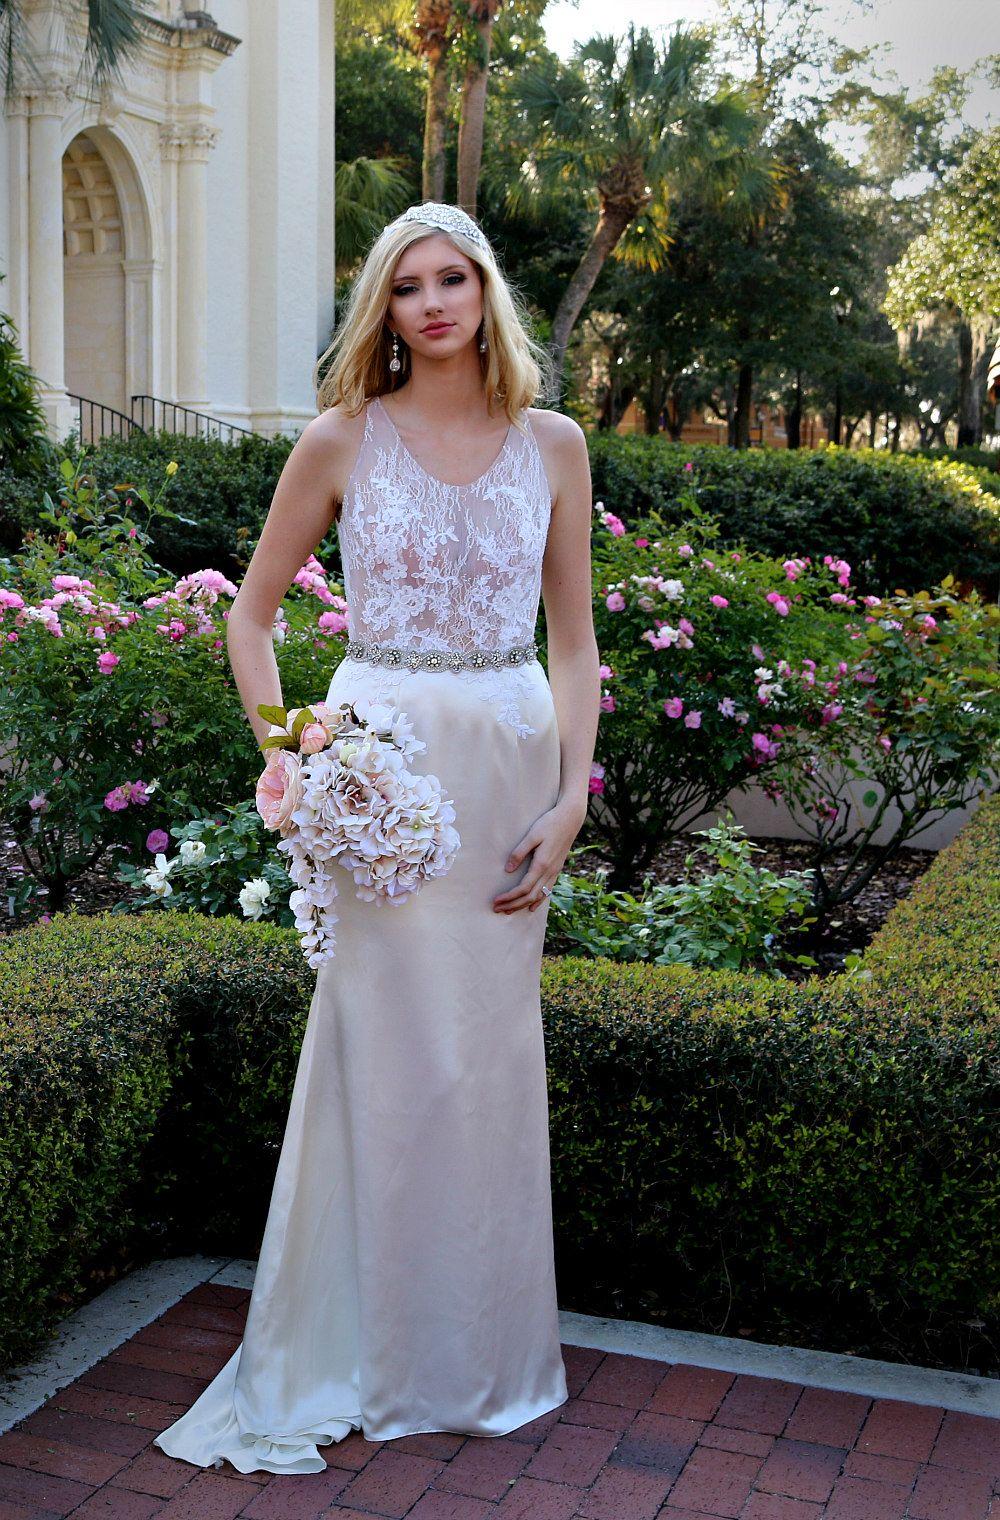 Lightweight wedding dresses  Silk Satin Wedding Dress Romantic Soft French Chantilly Lace Light